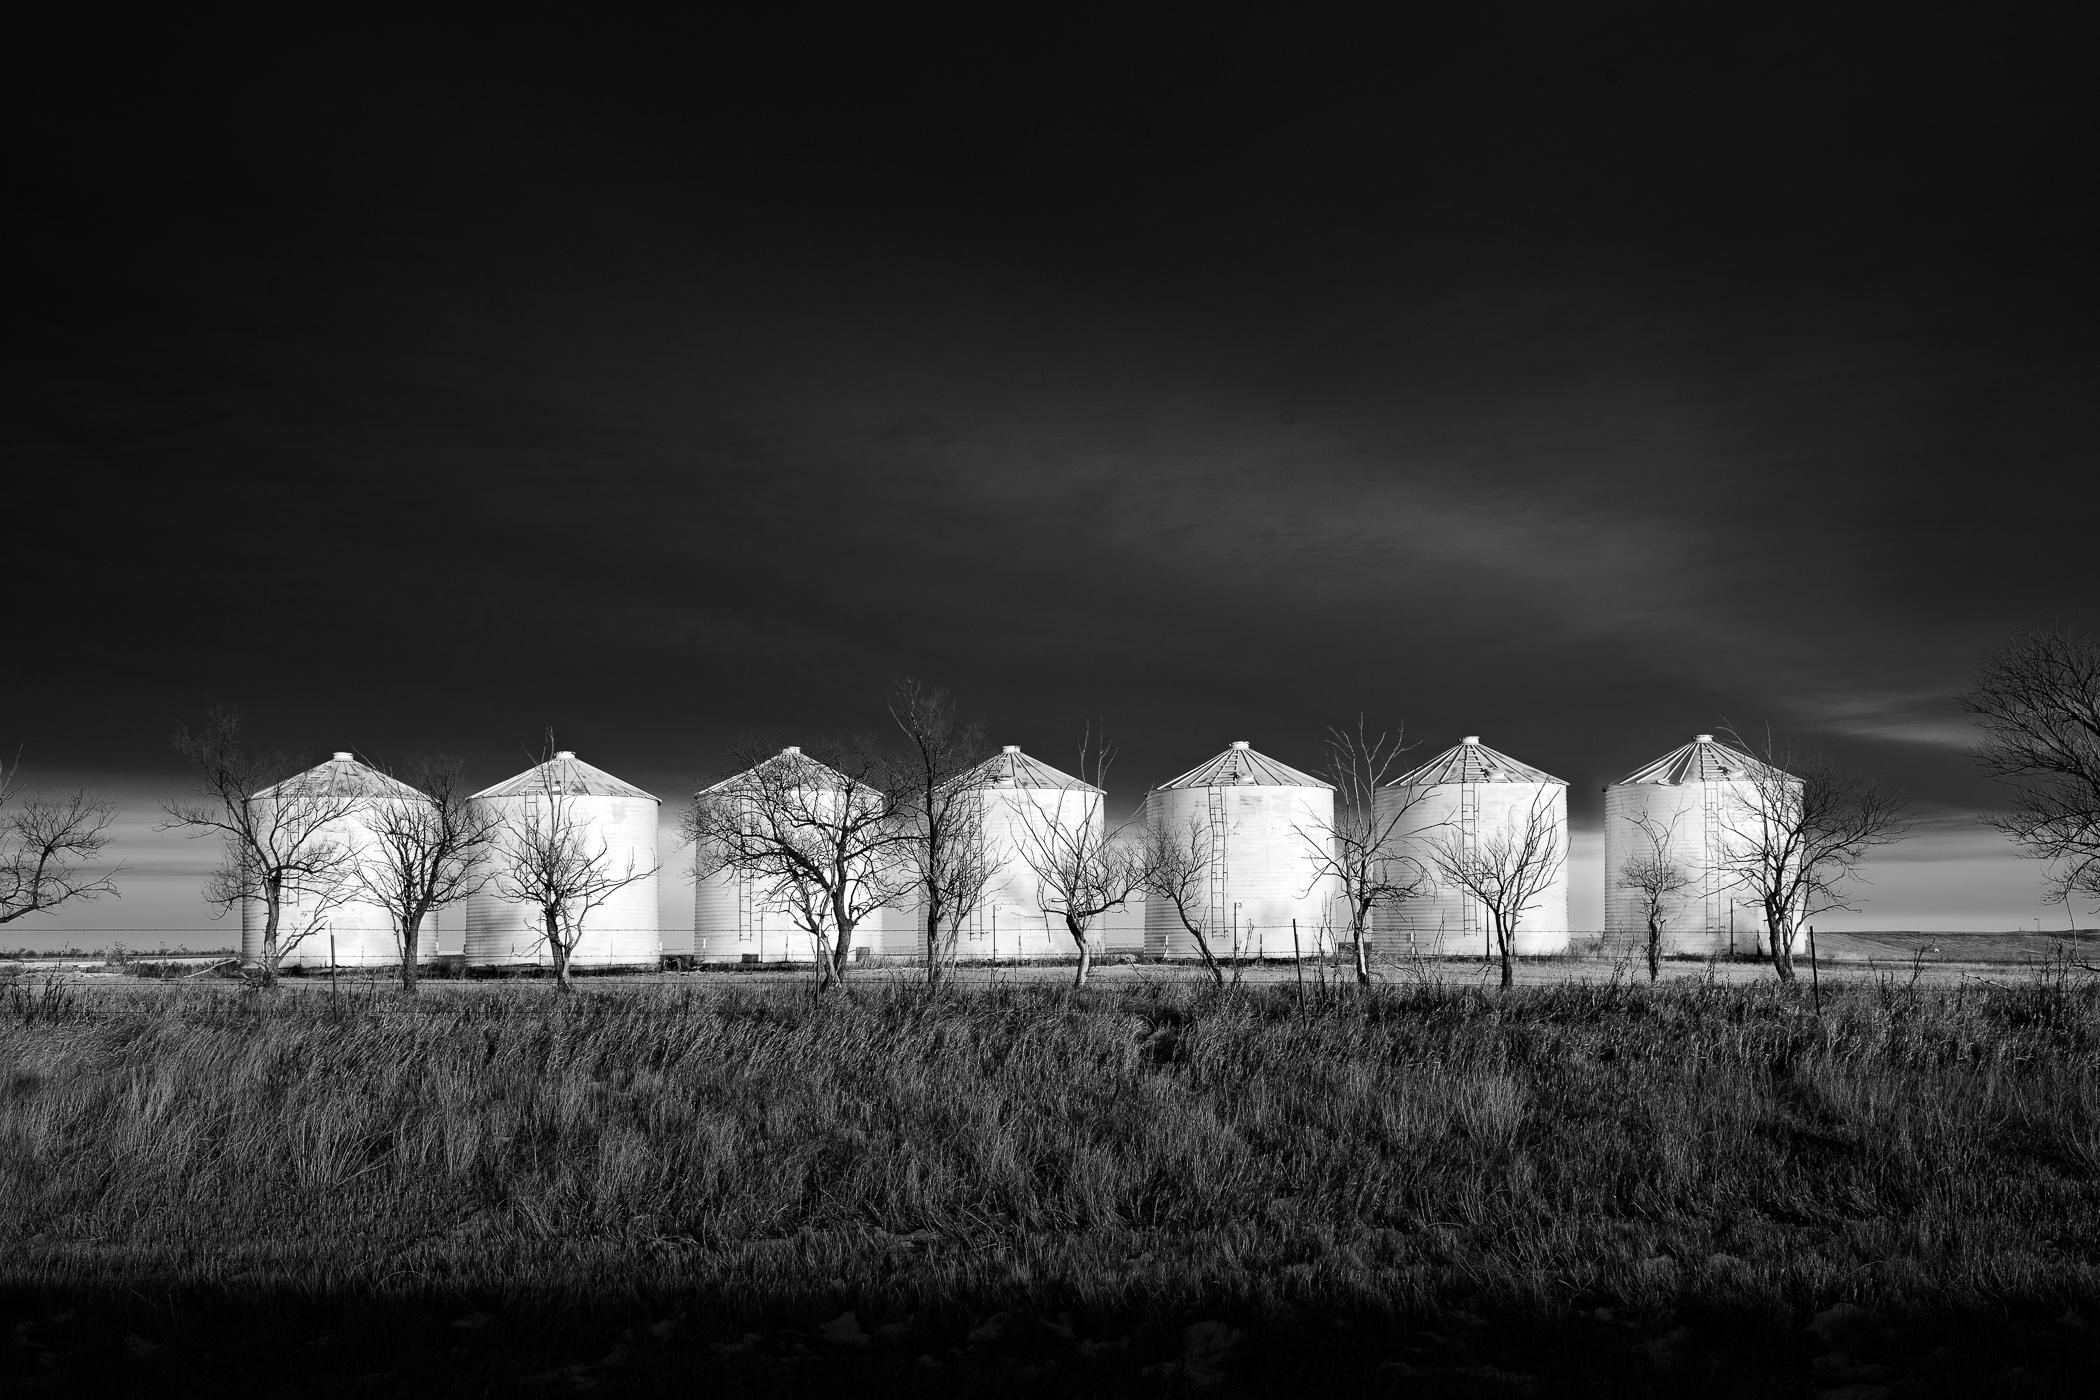 Seven Bins and Tree Row